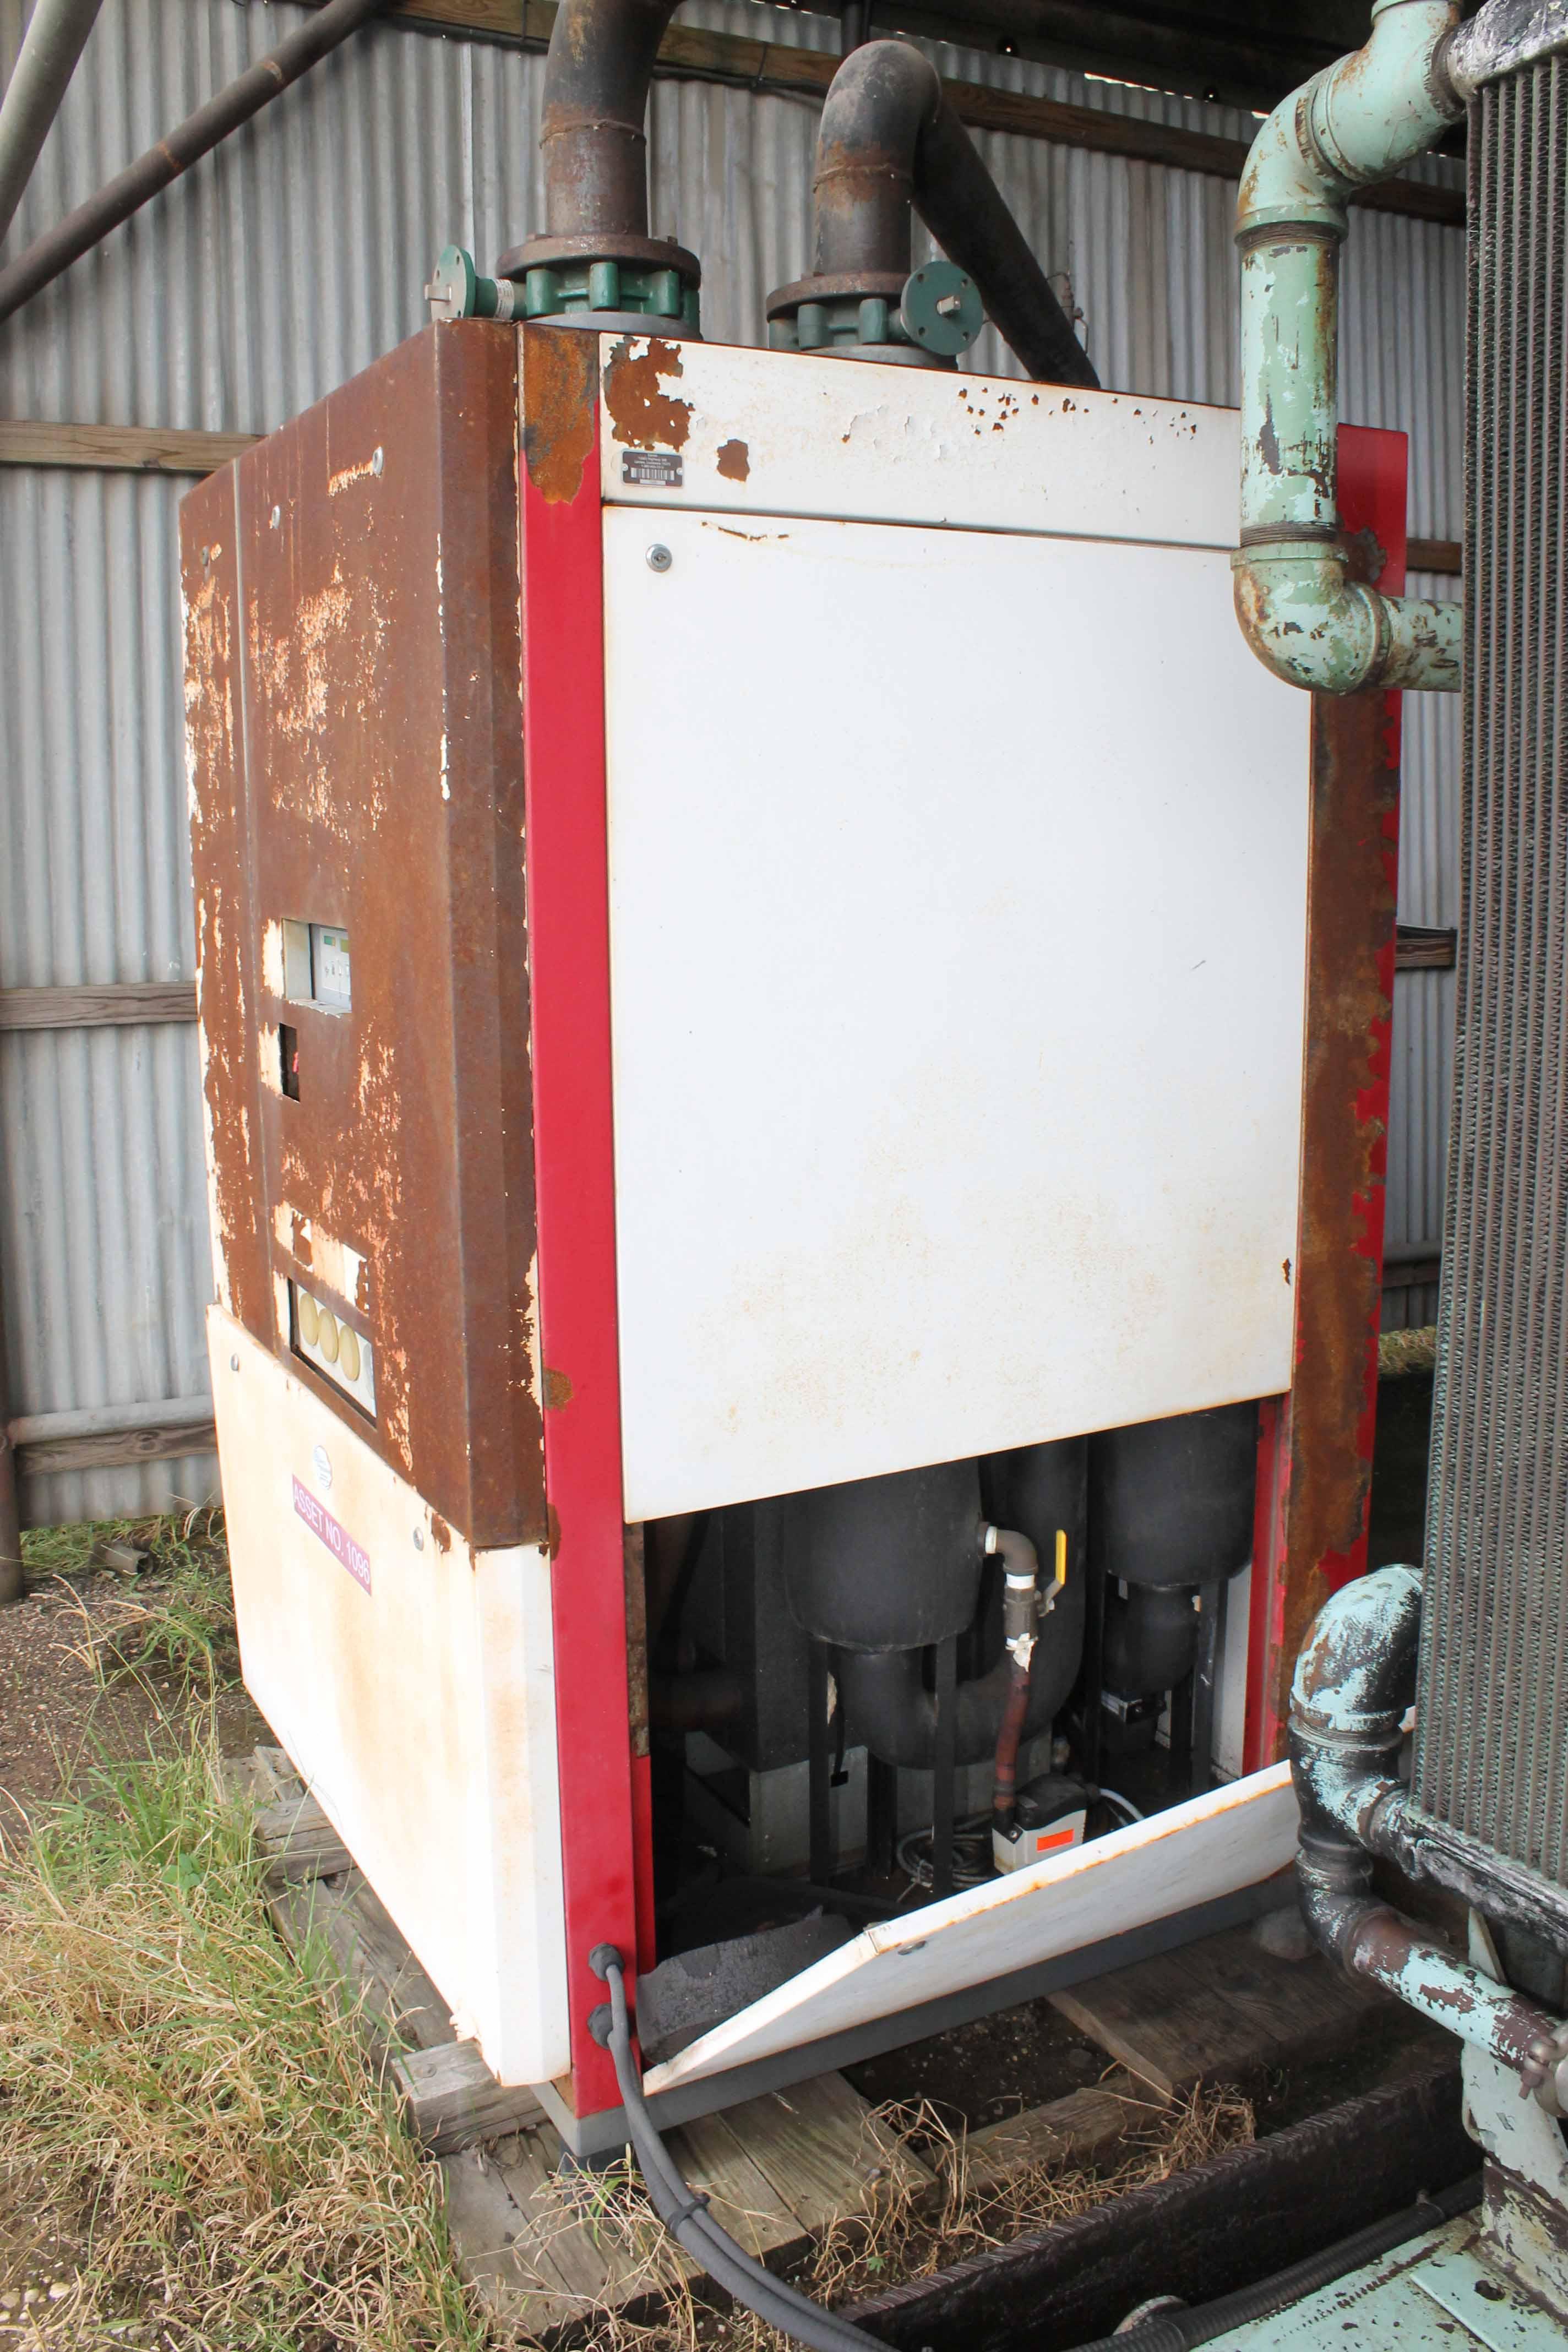 Lot 26 - Refrigerated Air Dryer, Gardner Denver, Series 1500, S/N RNC1500A4BFHRT. (Asset # 1096. Location: